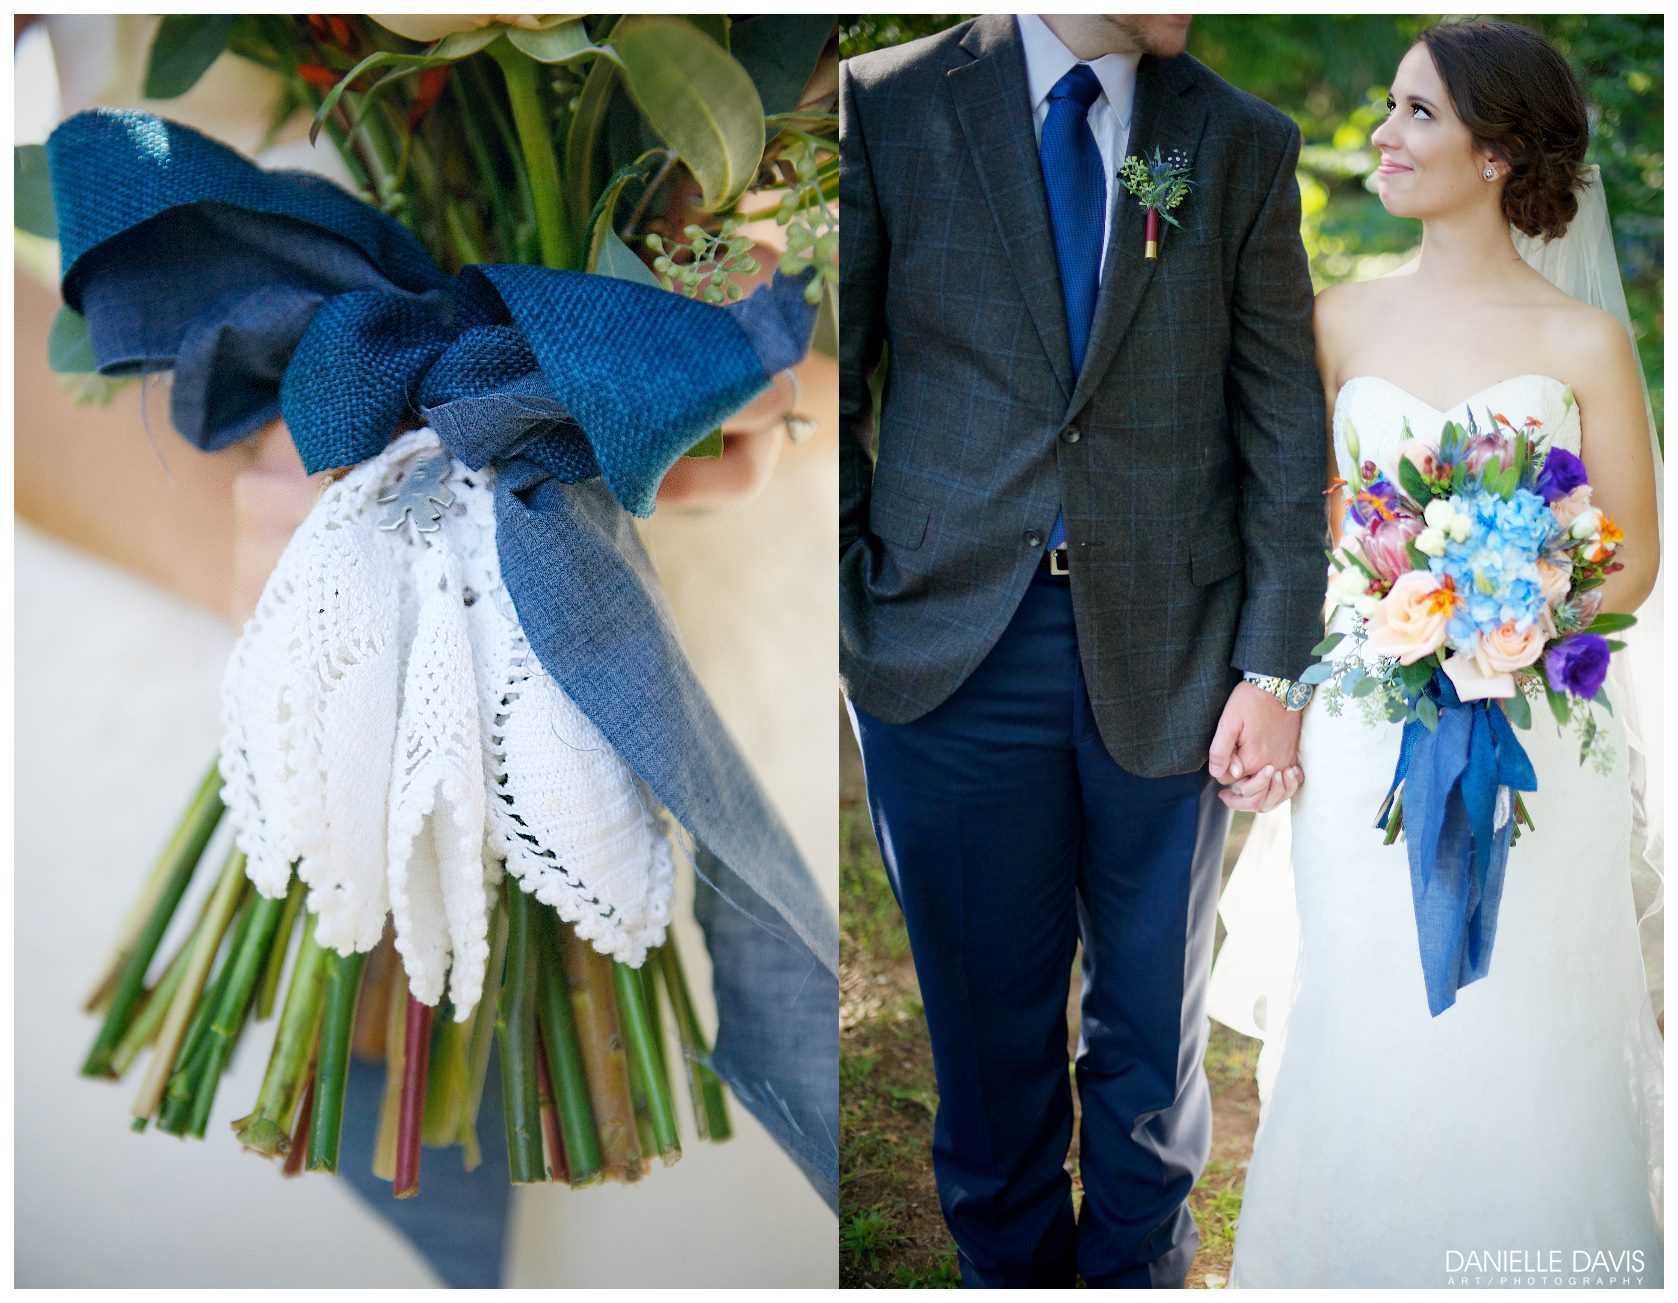 Danielle Davis Art/Photography  , from Emily + Blake's wedding at The Barn.